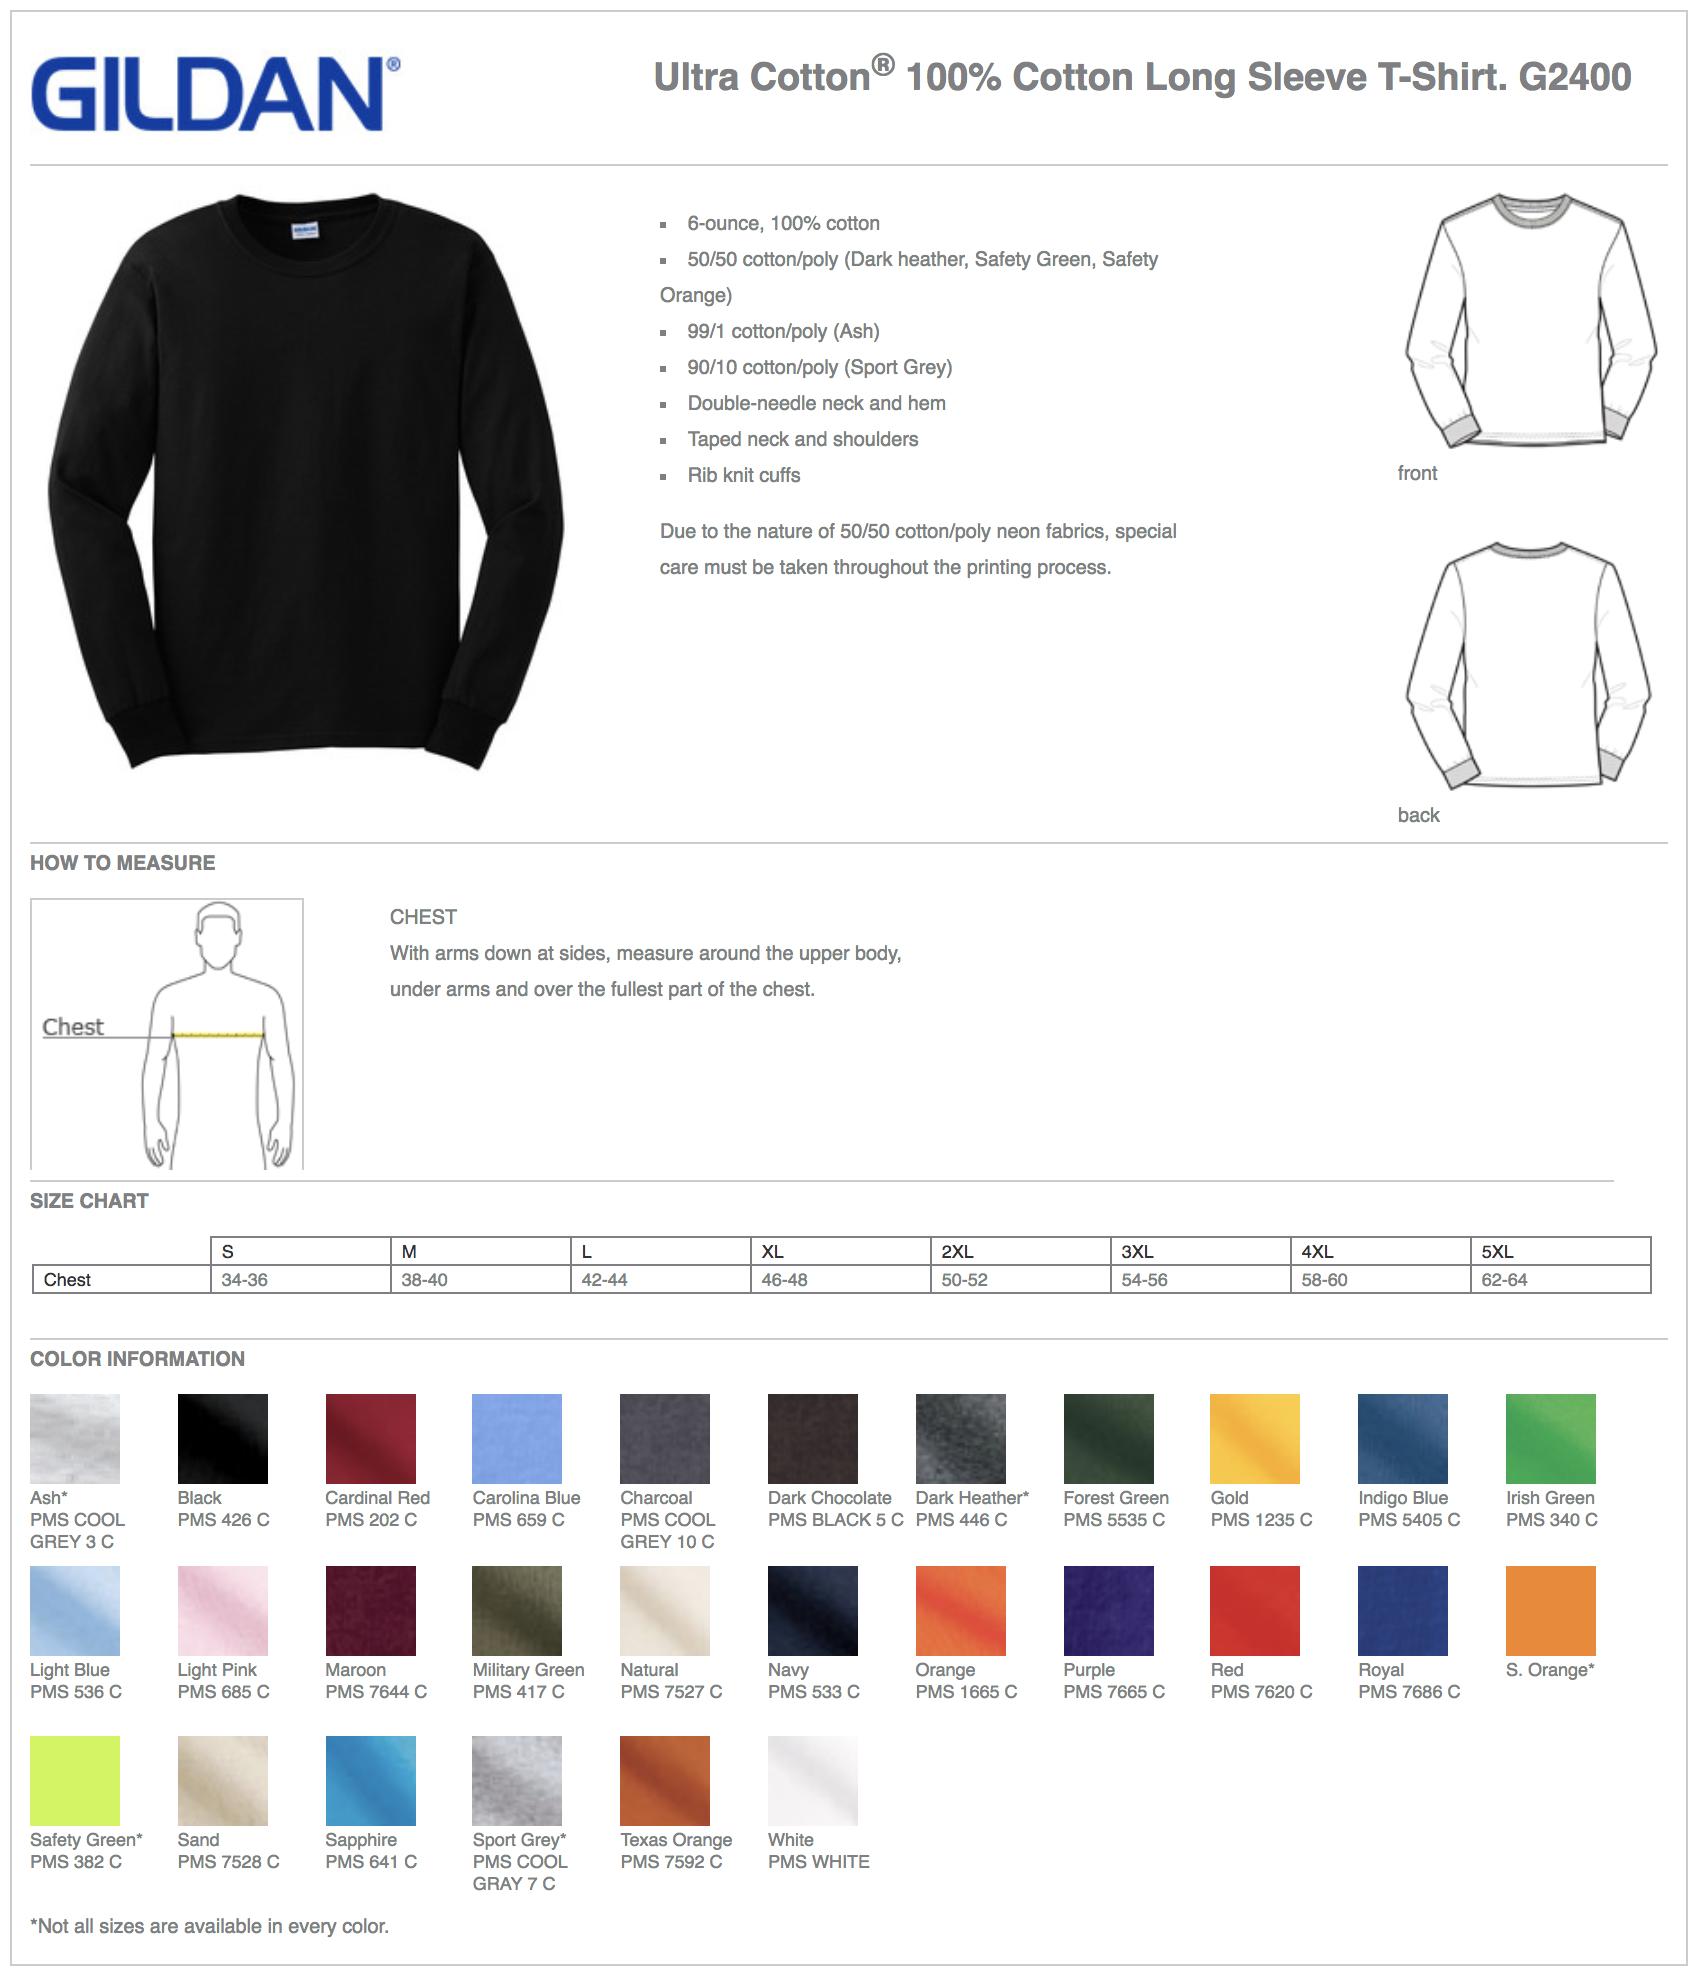 Gildan 2400 Custom Long Sleeve T-Shirts